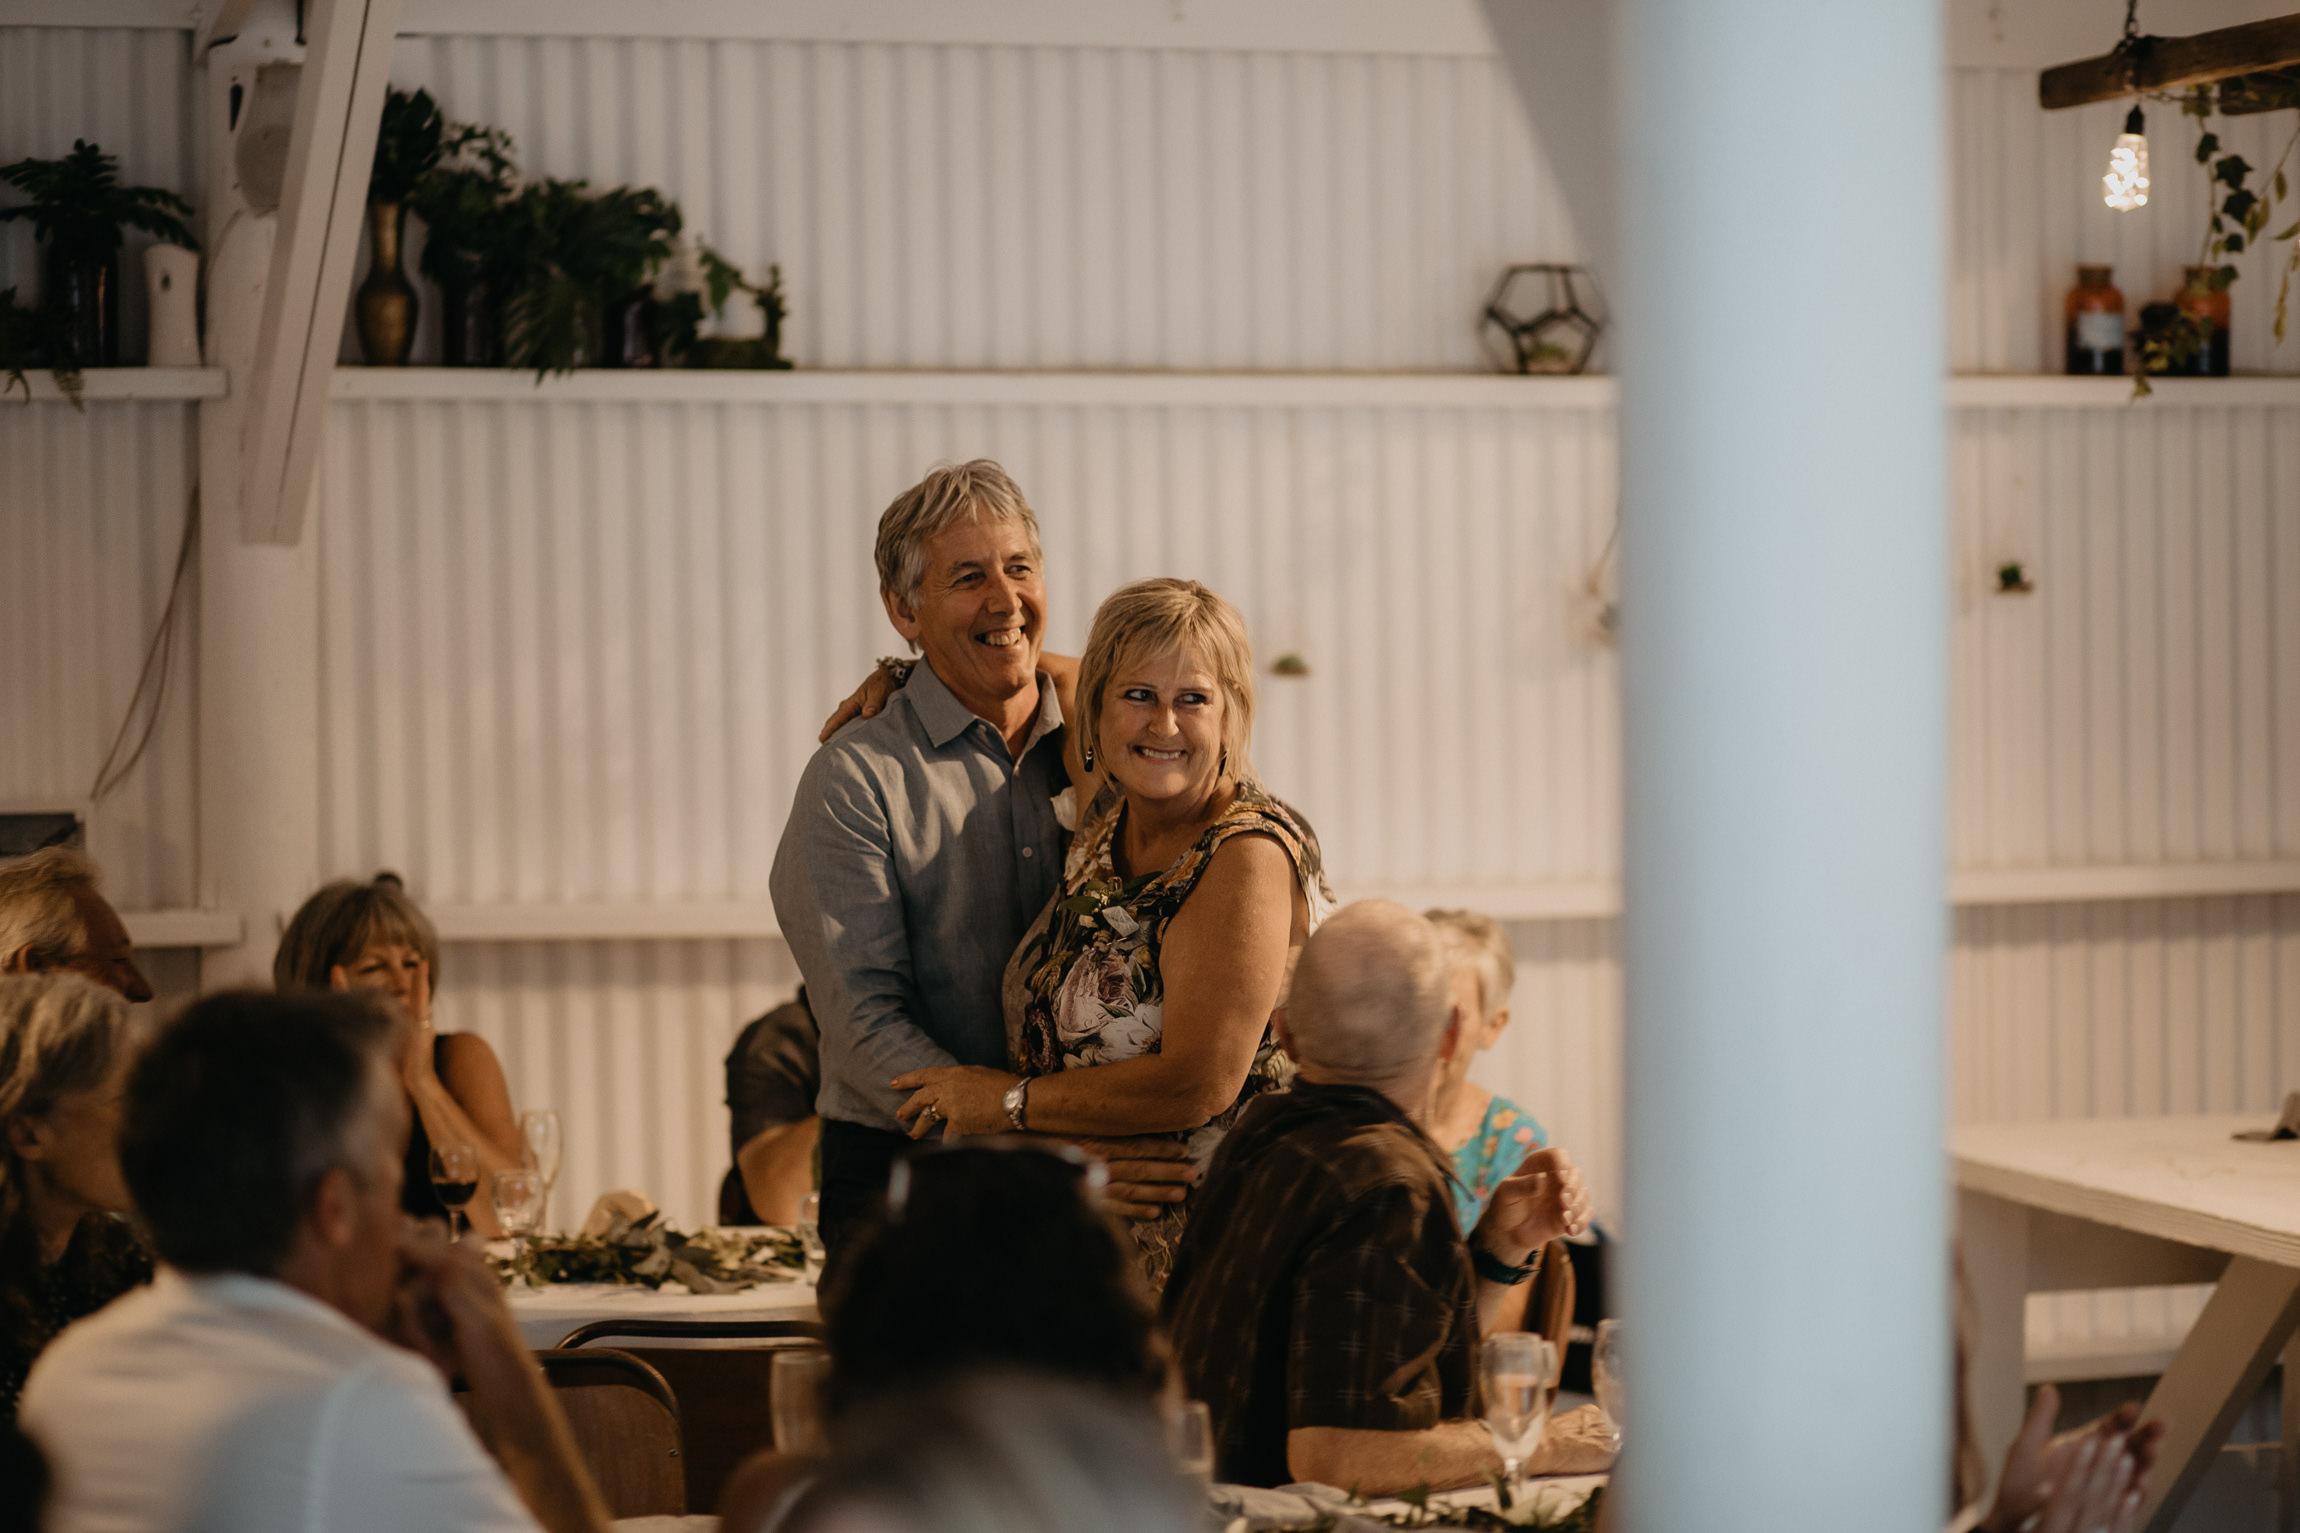 oldforestschool-wedding-blog-183.jpg